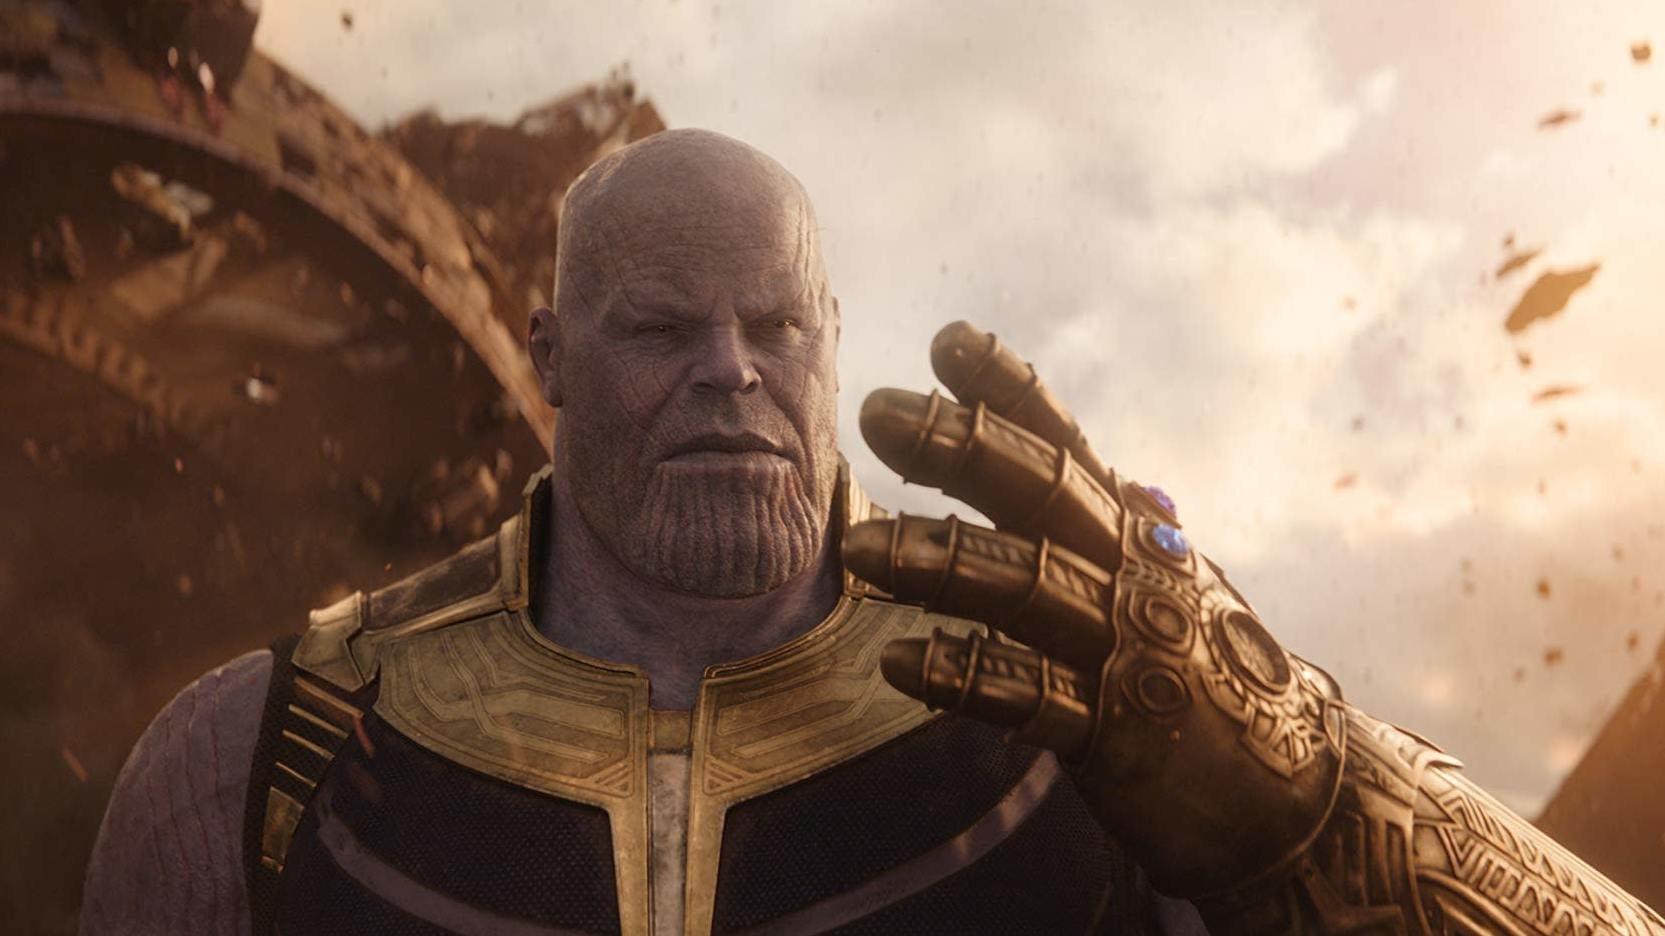 Celebrate 'Avengers: Endgame' With This Google Easter Egg